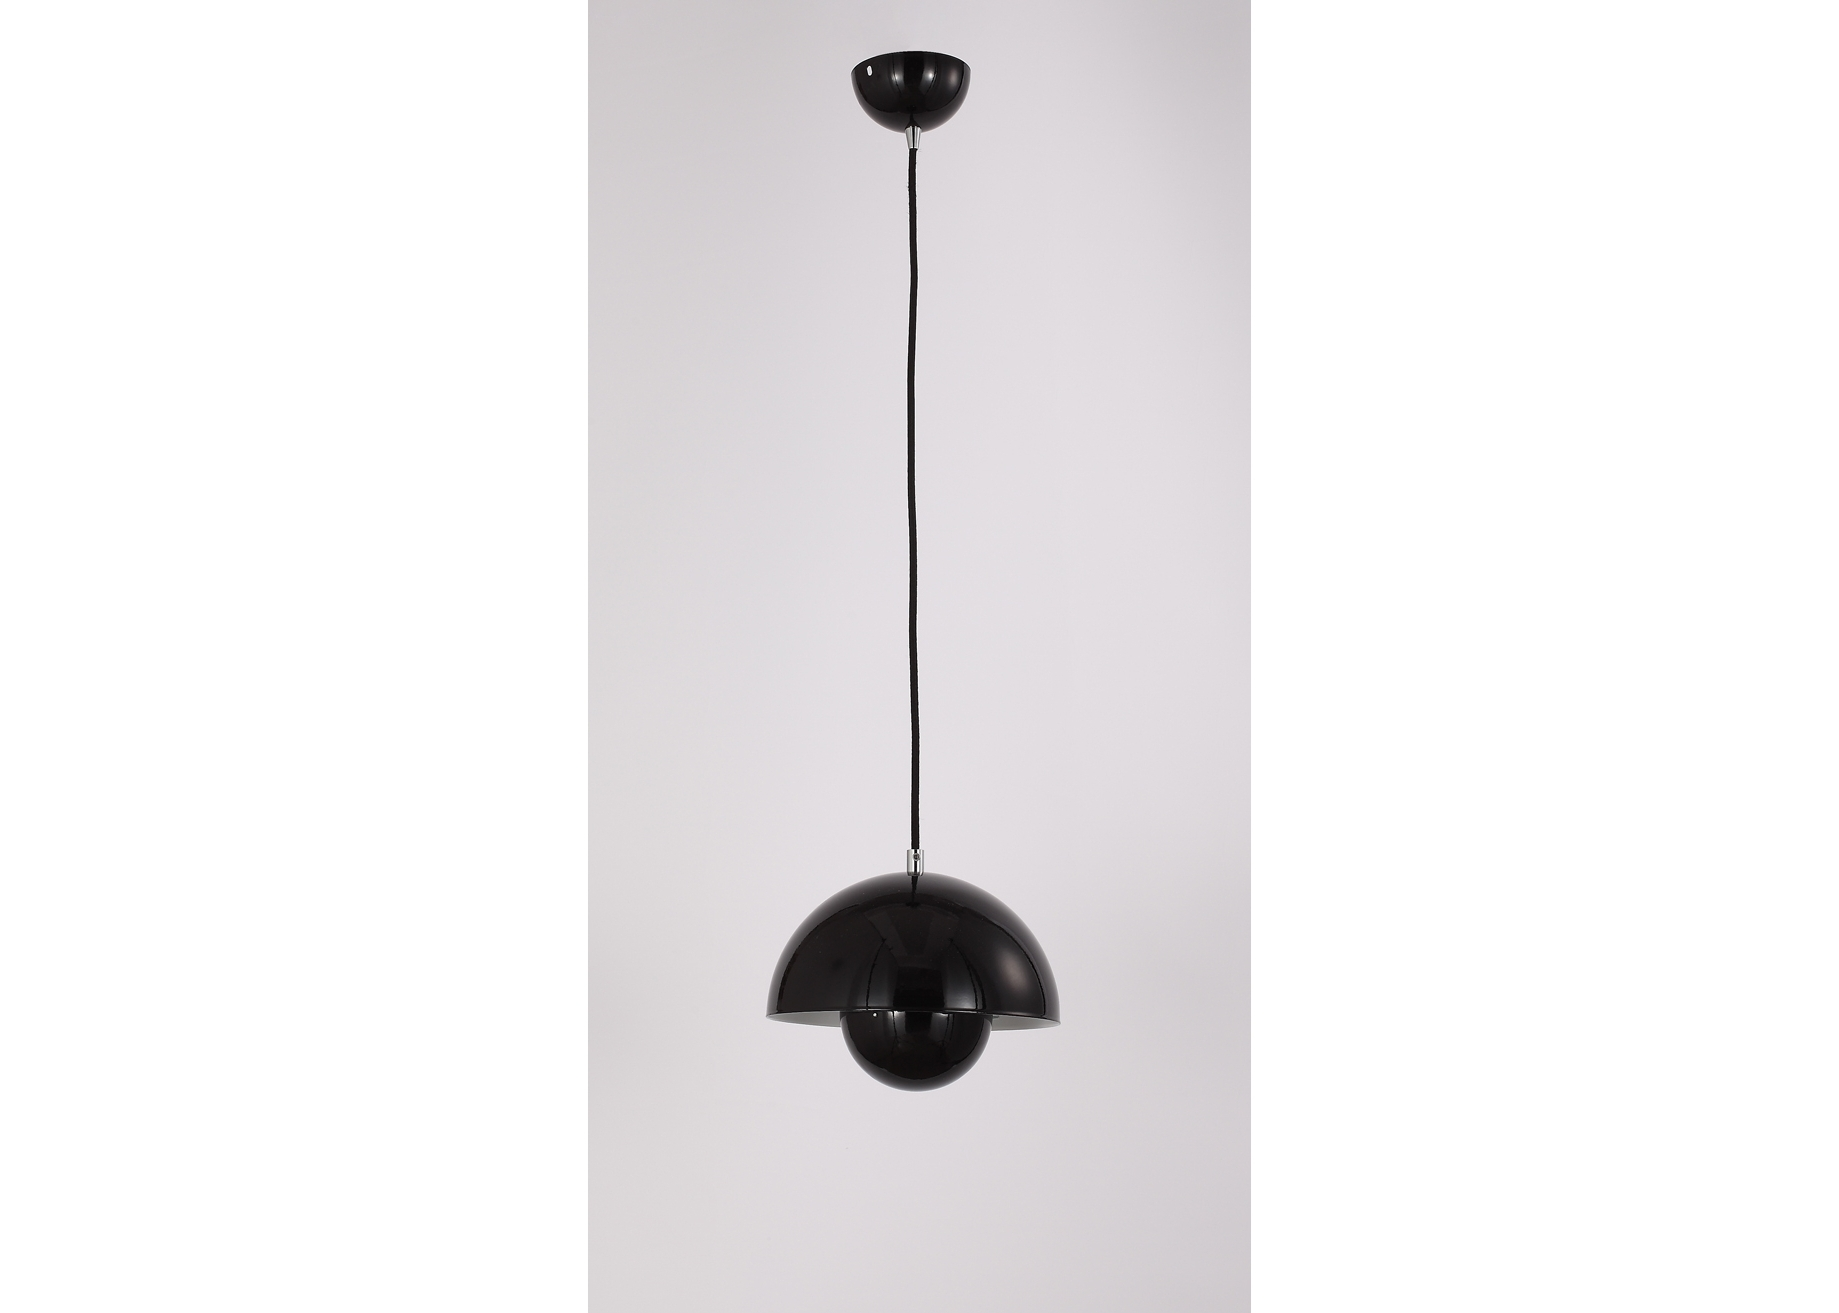 Подвесной светильник NarniПодвесные светильники<br>Материал: Металл<br>Design by Ketty Smith USA<br>Источник света: 1*60W (E27)<br>Особенности:<br>  а) Алюминий<br>  b) Цвет Black&amp;amp;nbsp;<br><br>Material: Металл<br>Height см: 50<br>Diameter см: 23